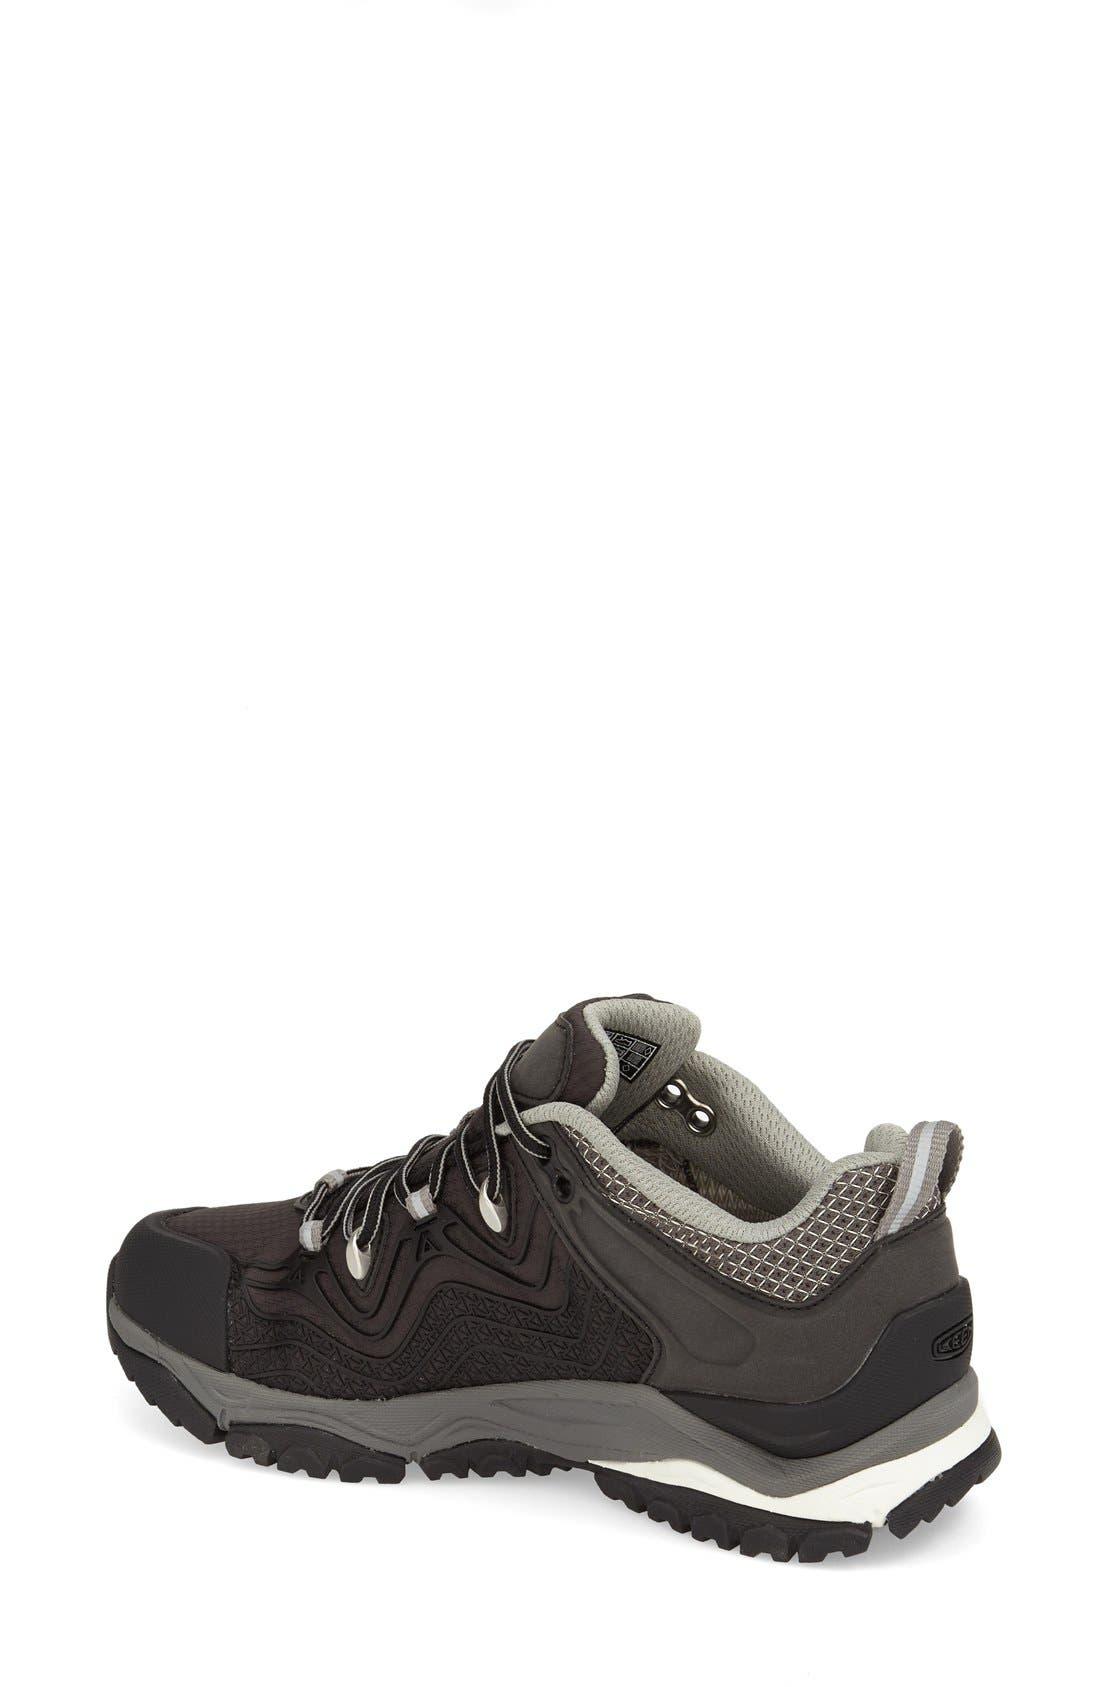 Alternate Image 2  - Keen 'Aphlex' Waterproof Hiking Boot (Women)